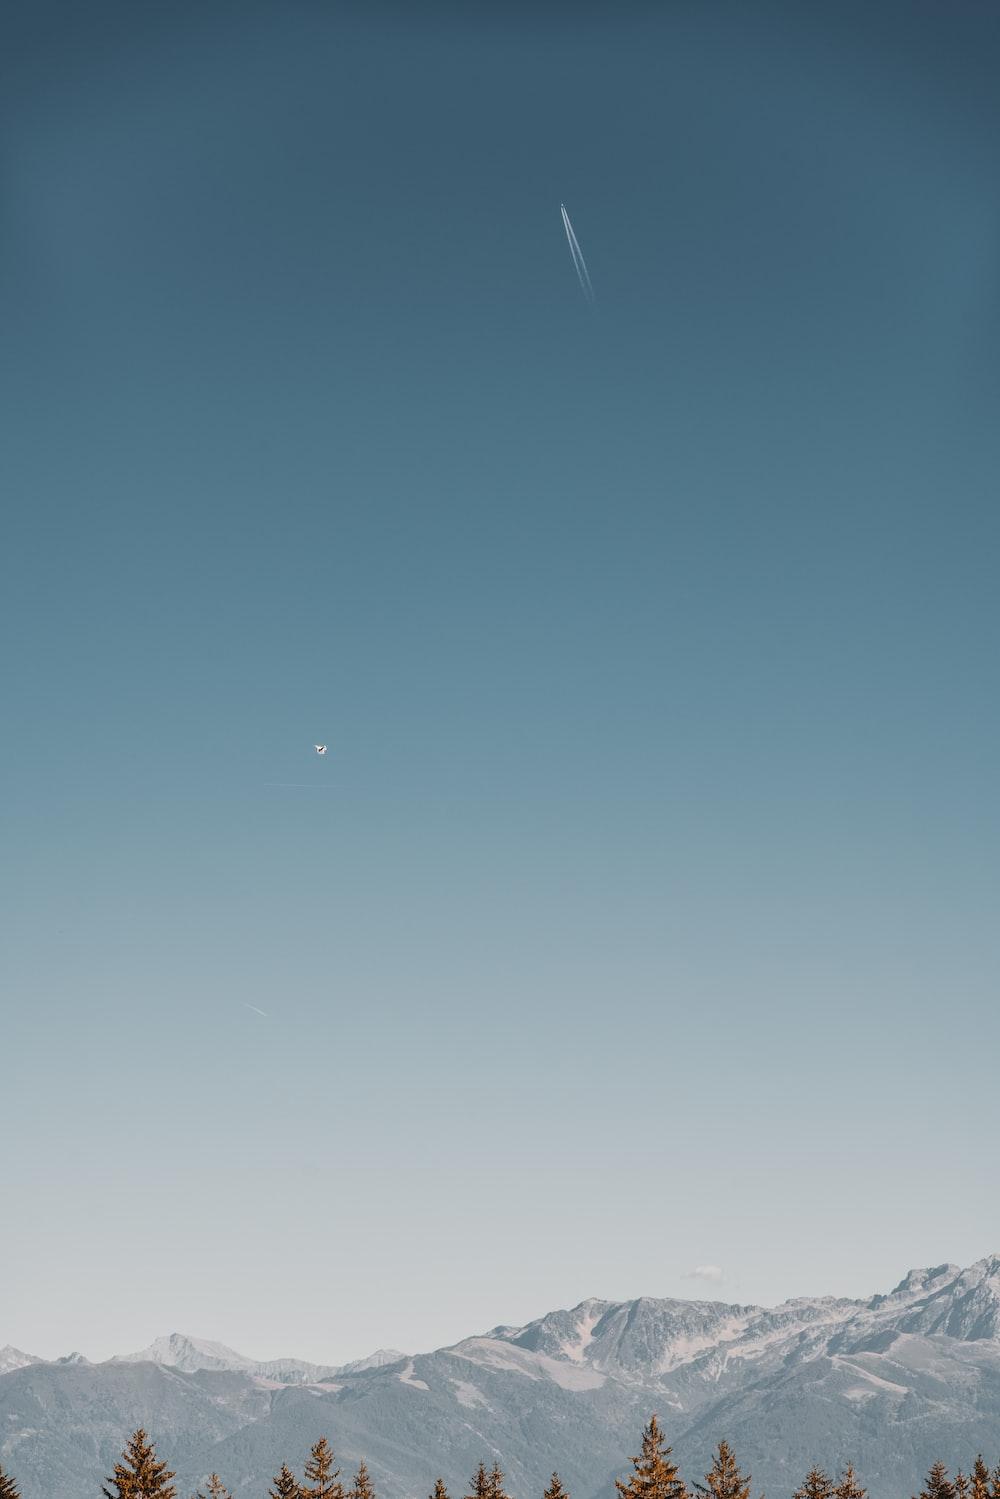 sky during daytime